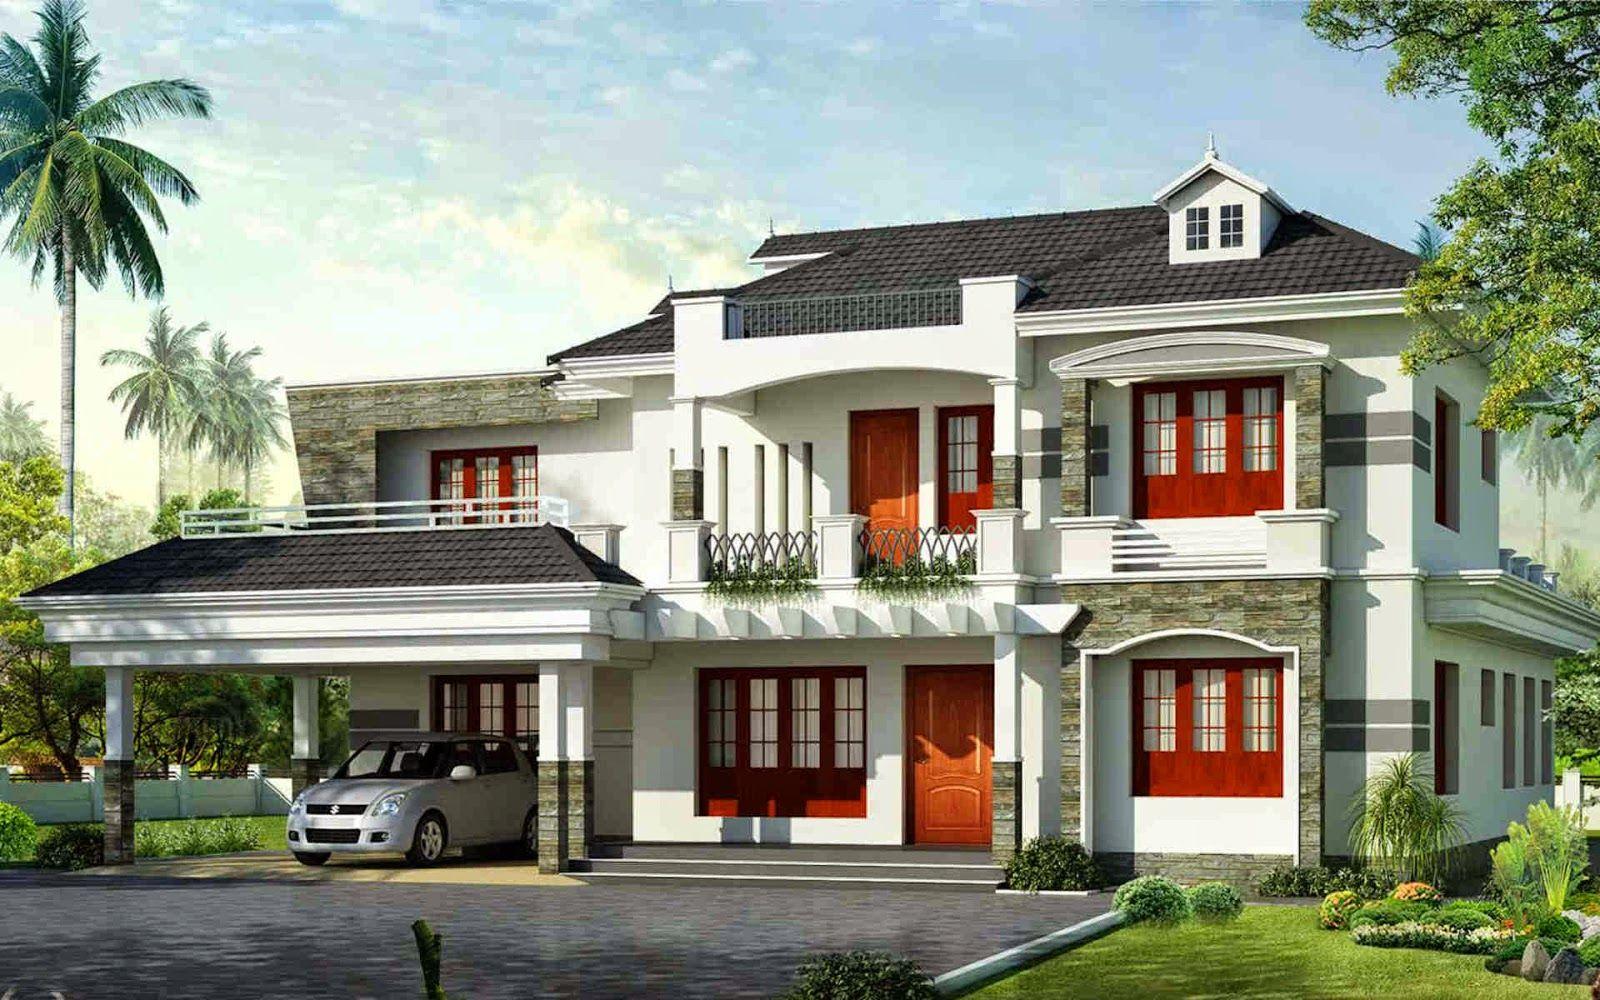 Exterior-Design-Kerala-Home-Design-wallpaper-pictures-hd ...